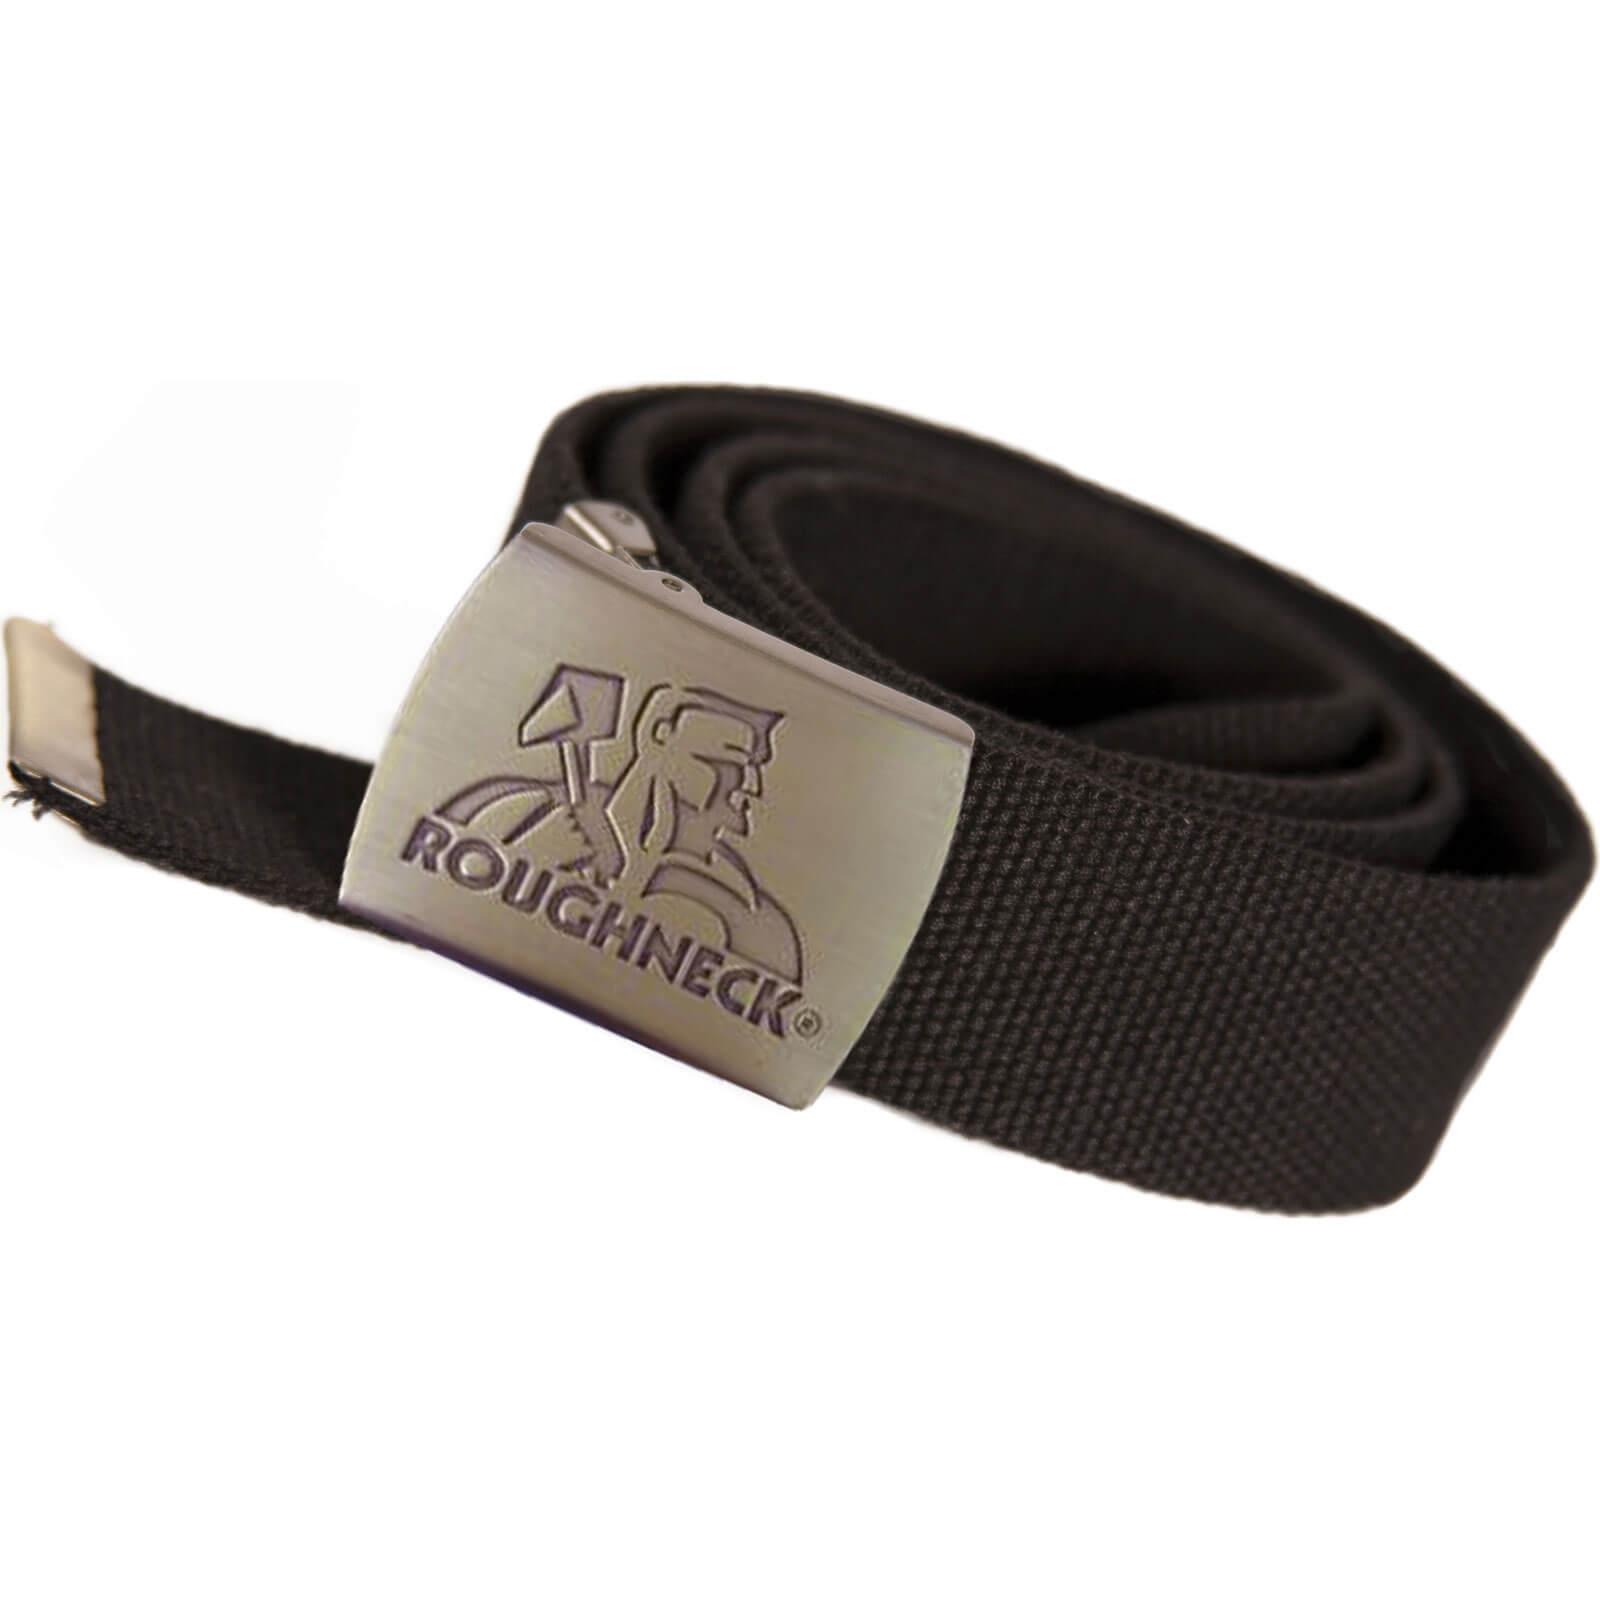 Roughneck Canvas Belt Black One Size